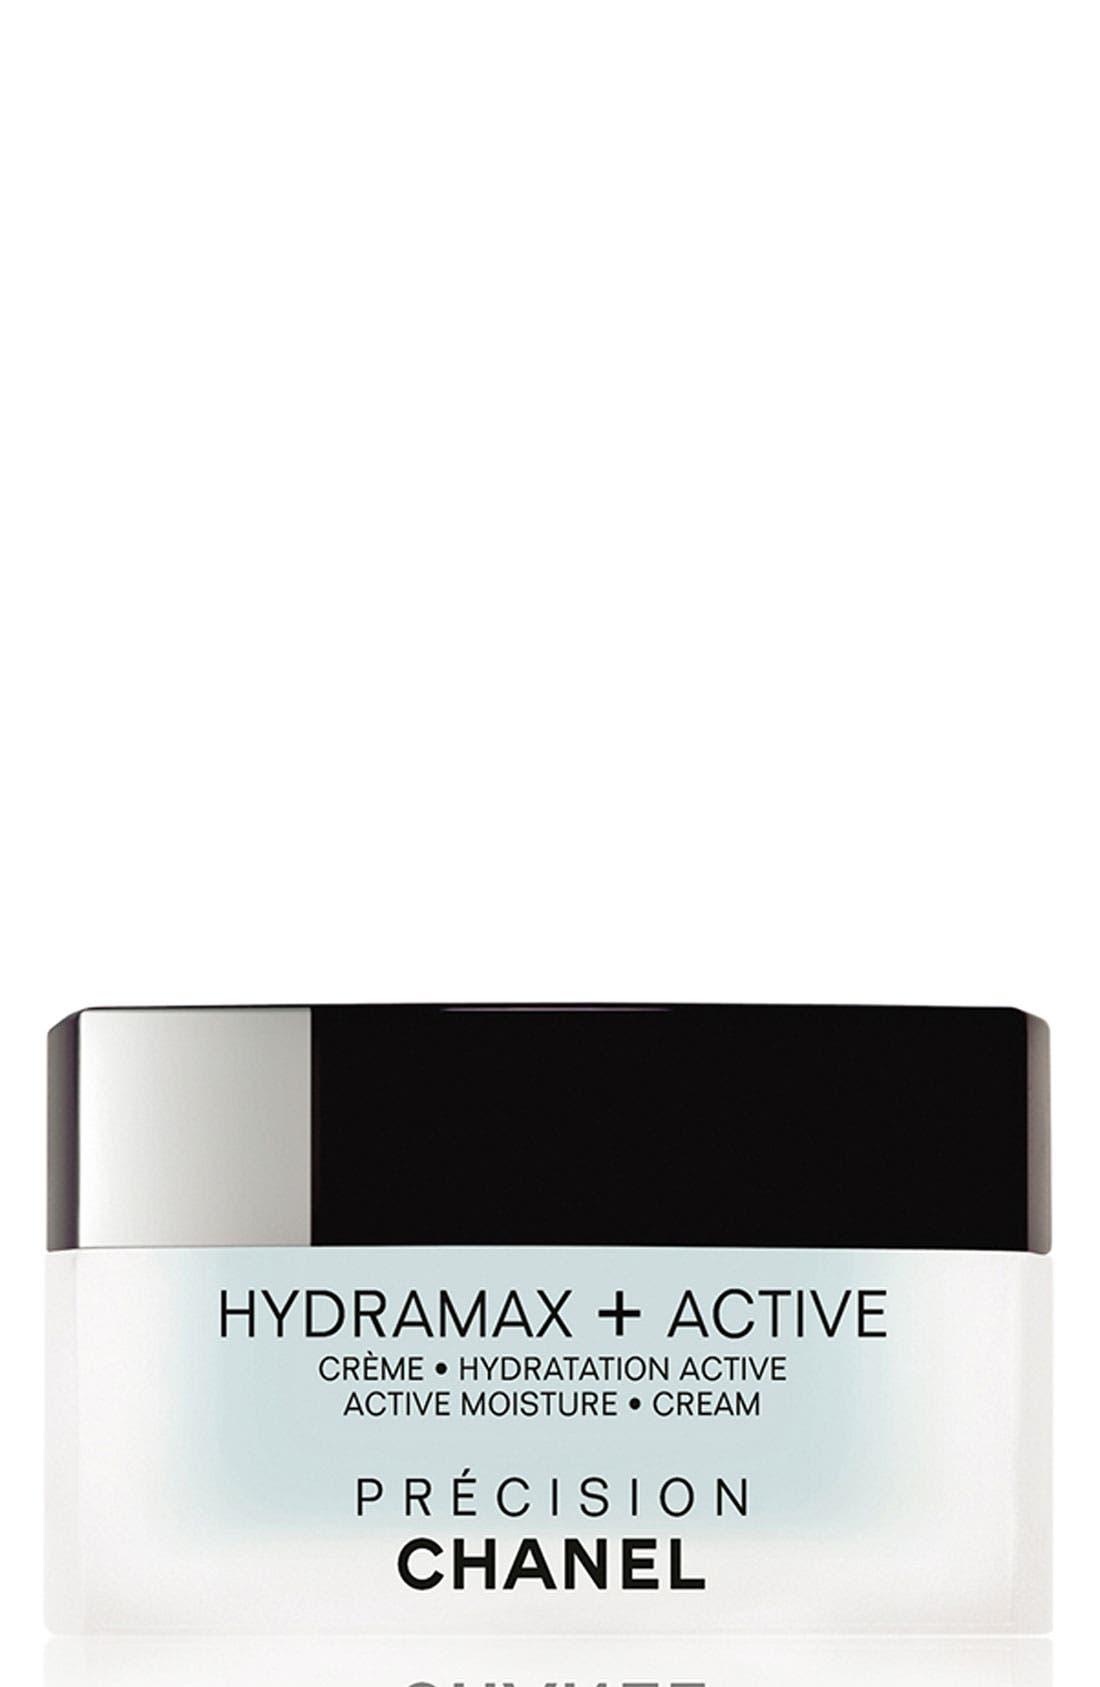 HYDRAMAX + ACTIVE CRÈME HYDRATION ACTIVE ACTIVE MOISTURE CREAM, Main, color, 000